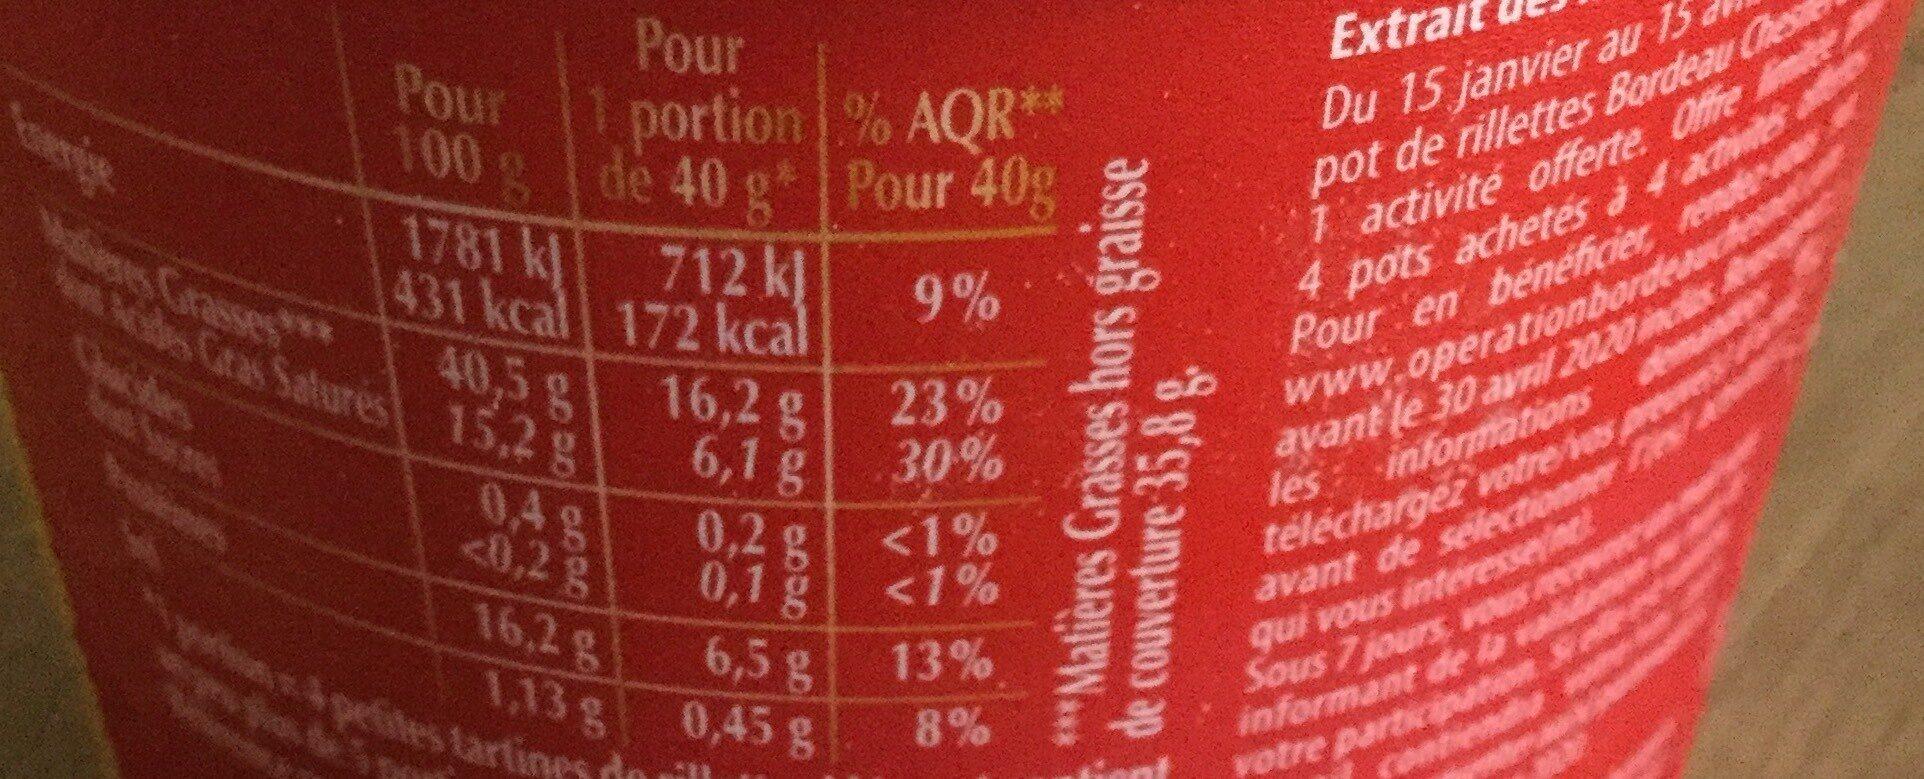 Rillettes - Informations nutritionnelles - fr